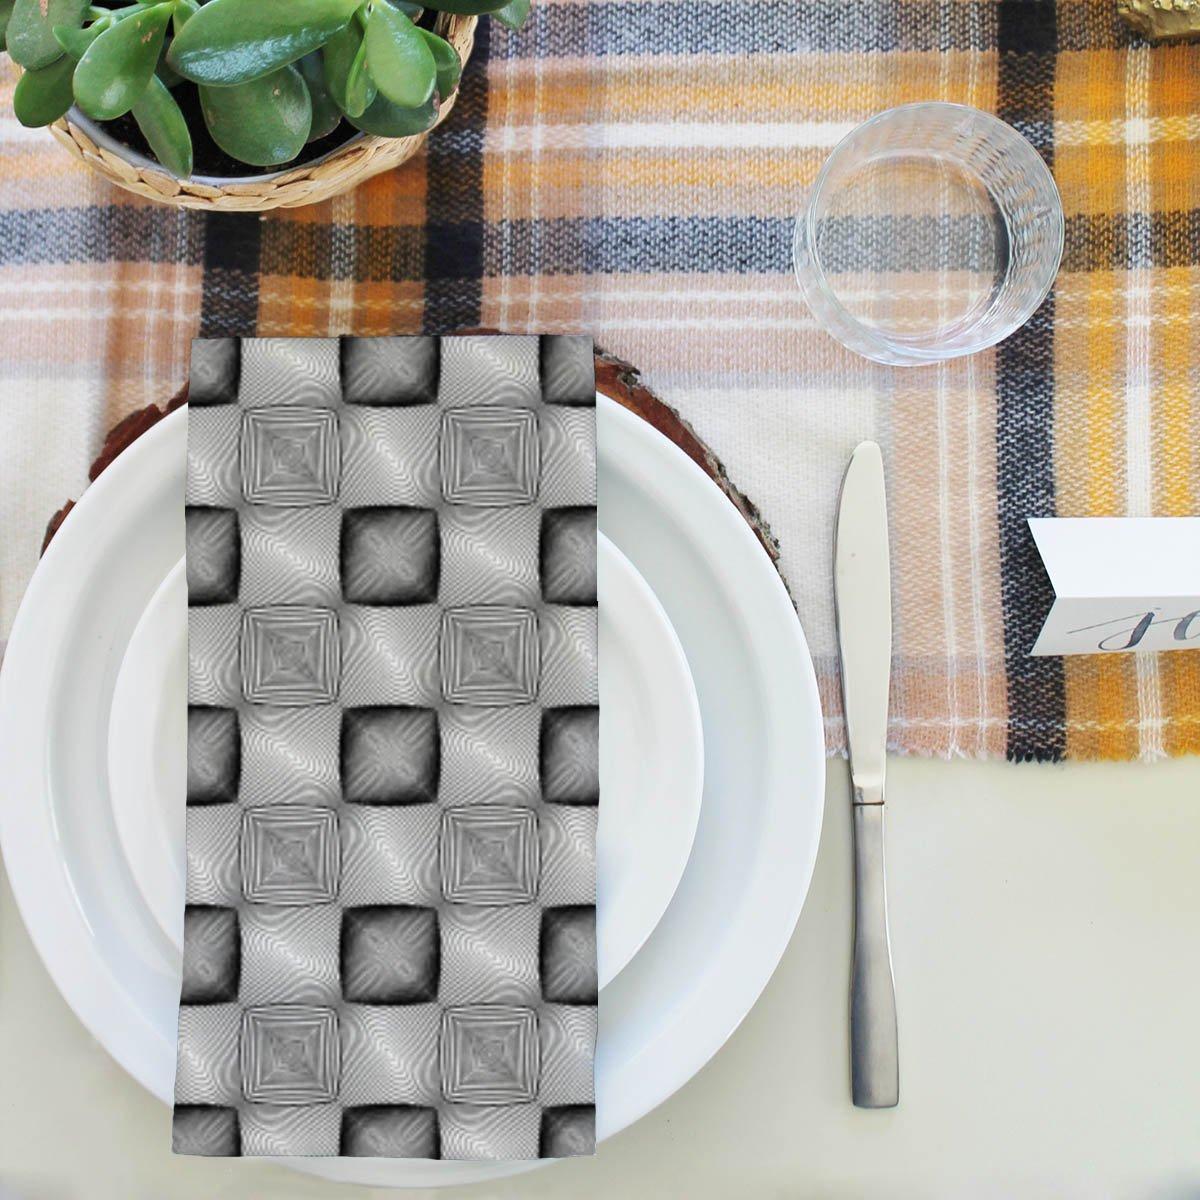 artzfolio Monochrome Squaresテーブルナプキンサテン生地 20inch x 20inch; SINGLE PIECE AZKIT38392582NAP_TB_L_02-S1_SN 20inch x 20inch; SINGLE PIECE Premium Satin B07FGG55ZC